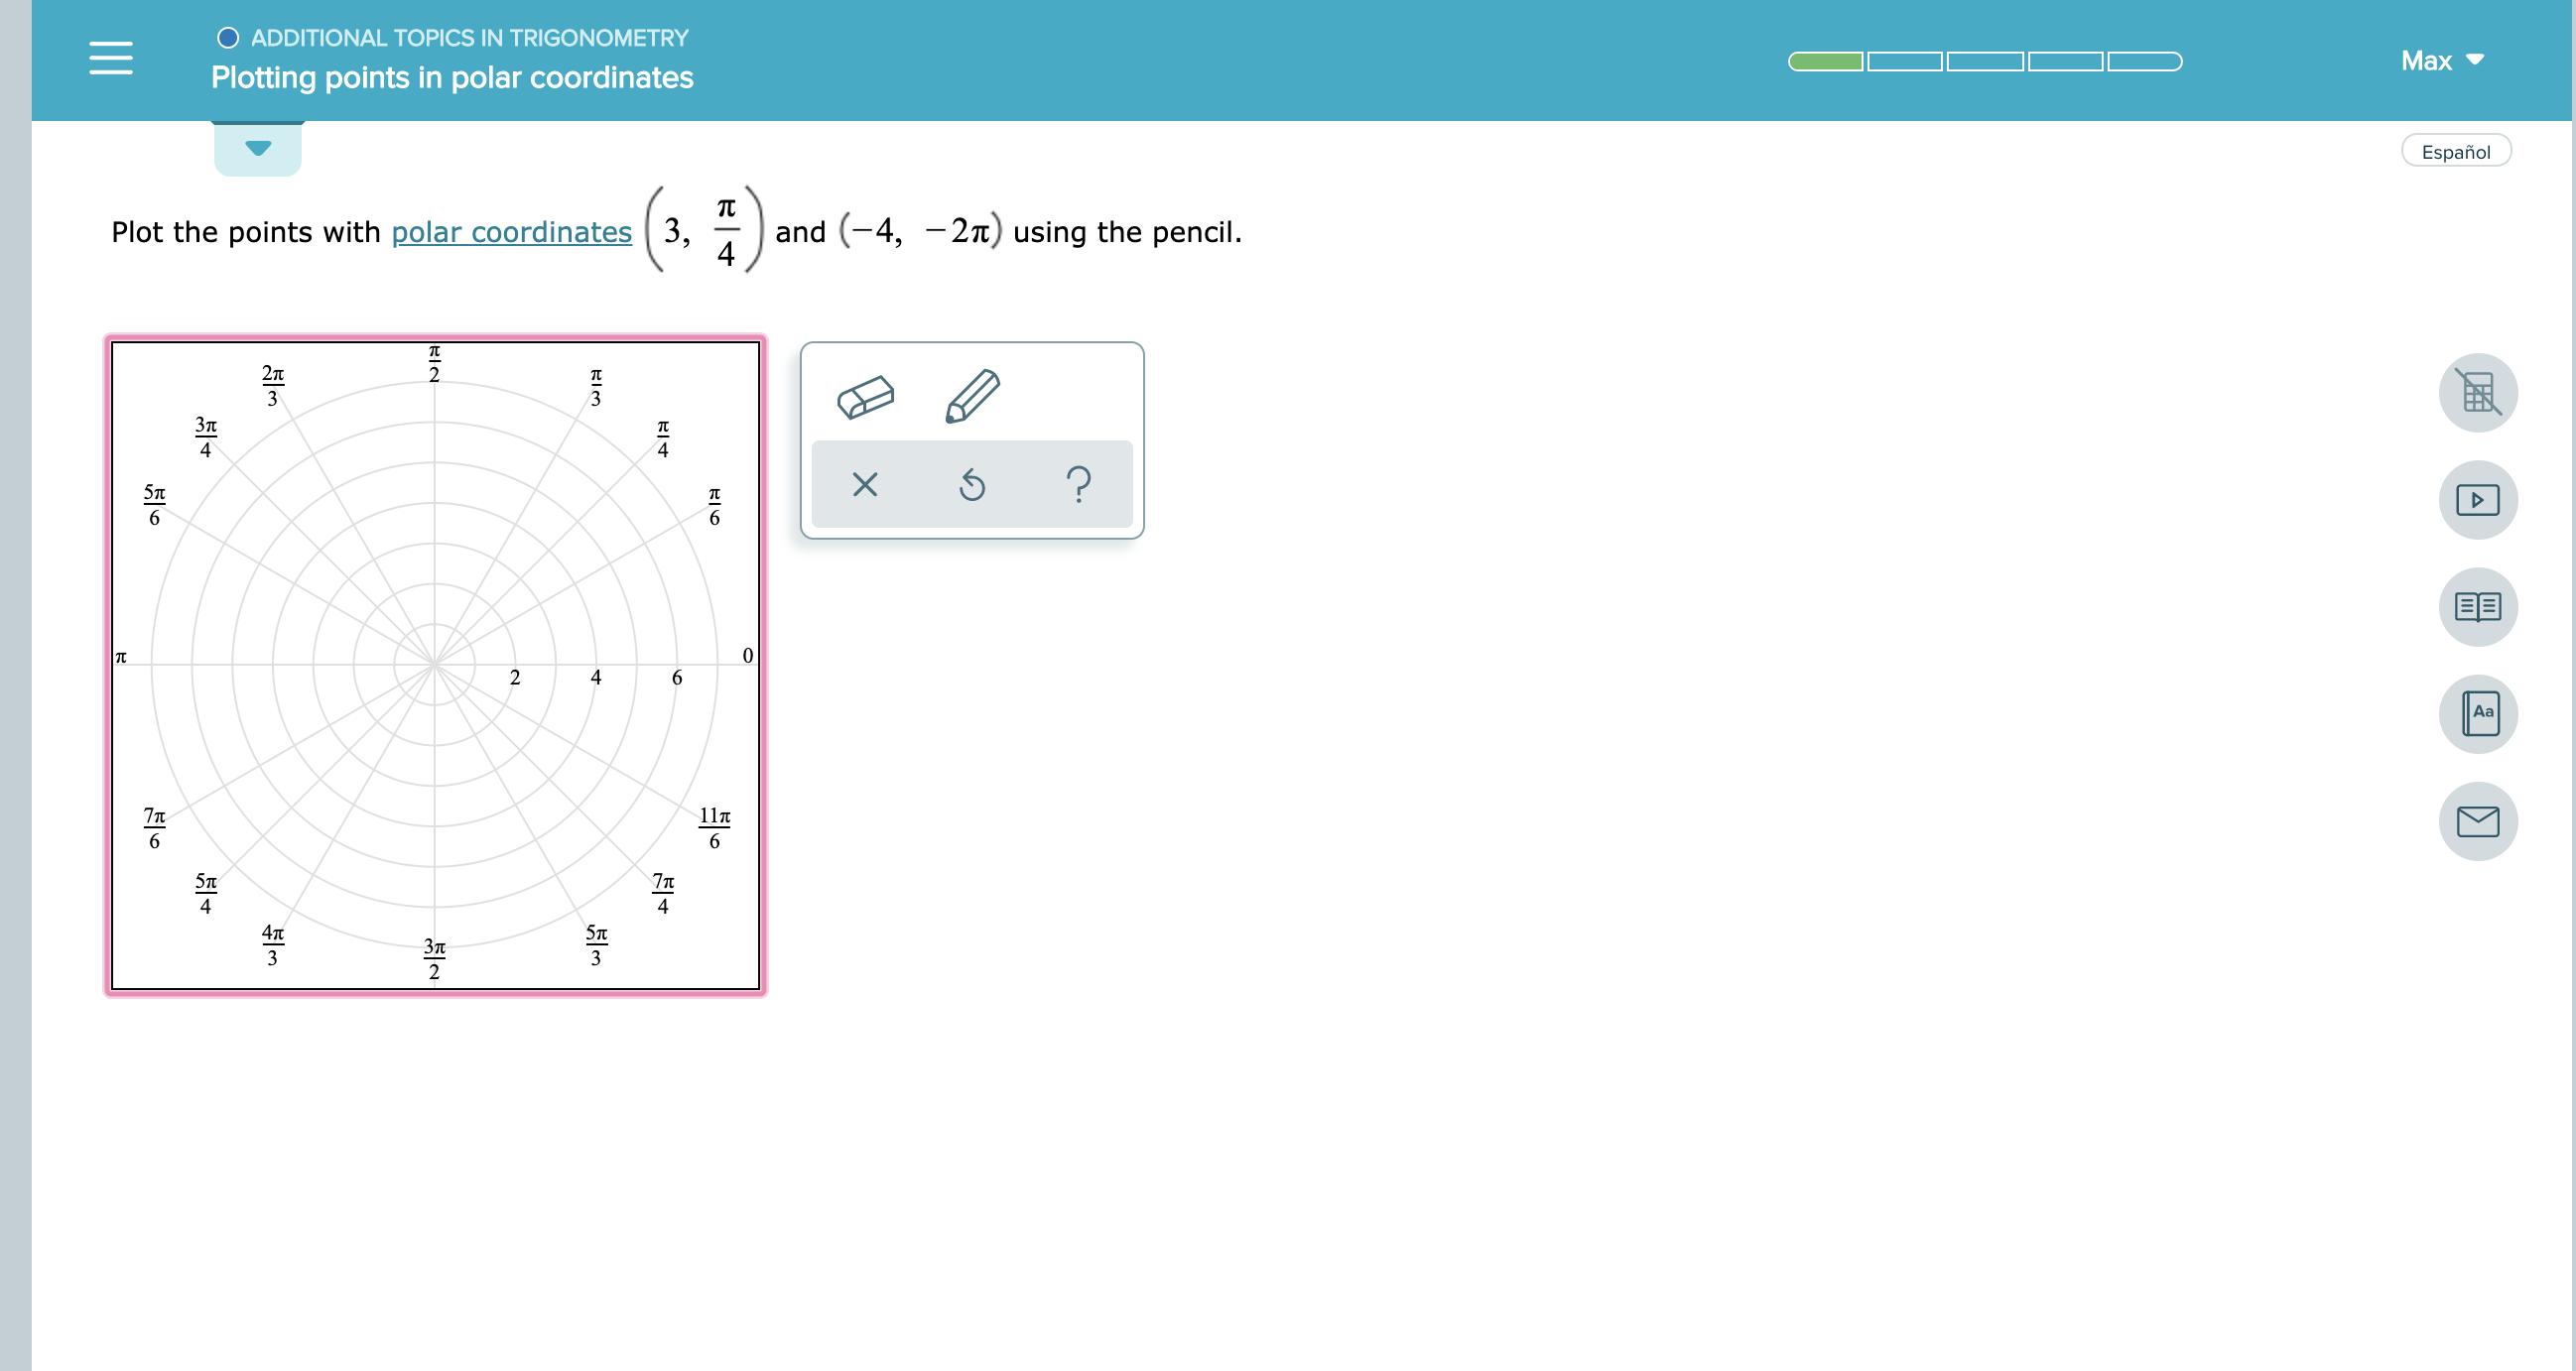 OADDITIONAL TOPICS IN TRIGONOMETRY Max Plotting points in polar coordinates Español and (4, -2) using the pencil Plot the points with polar coordinates 3, 2п 2 3 3 Зп ? X 6 6 EE 0 2 4 6 Аа 7T 117t 6 6 5п 7T 4п 5п Зл 3 3 2